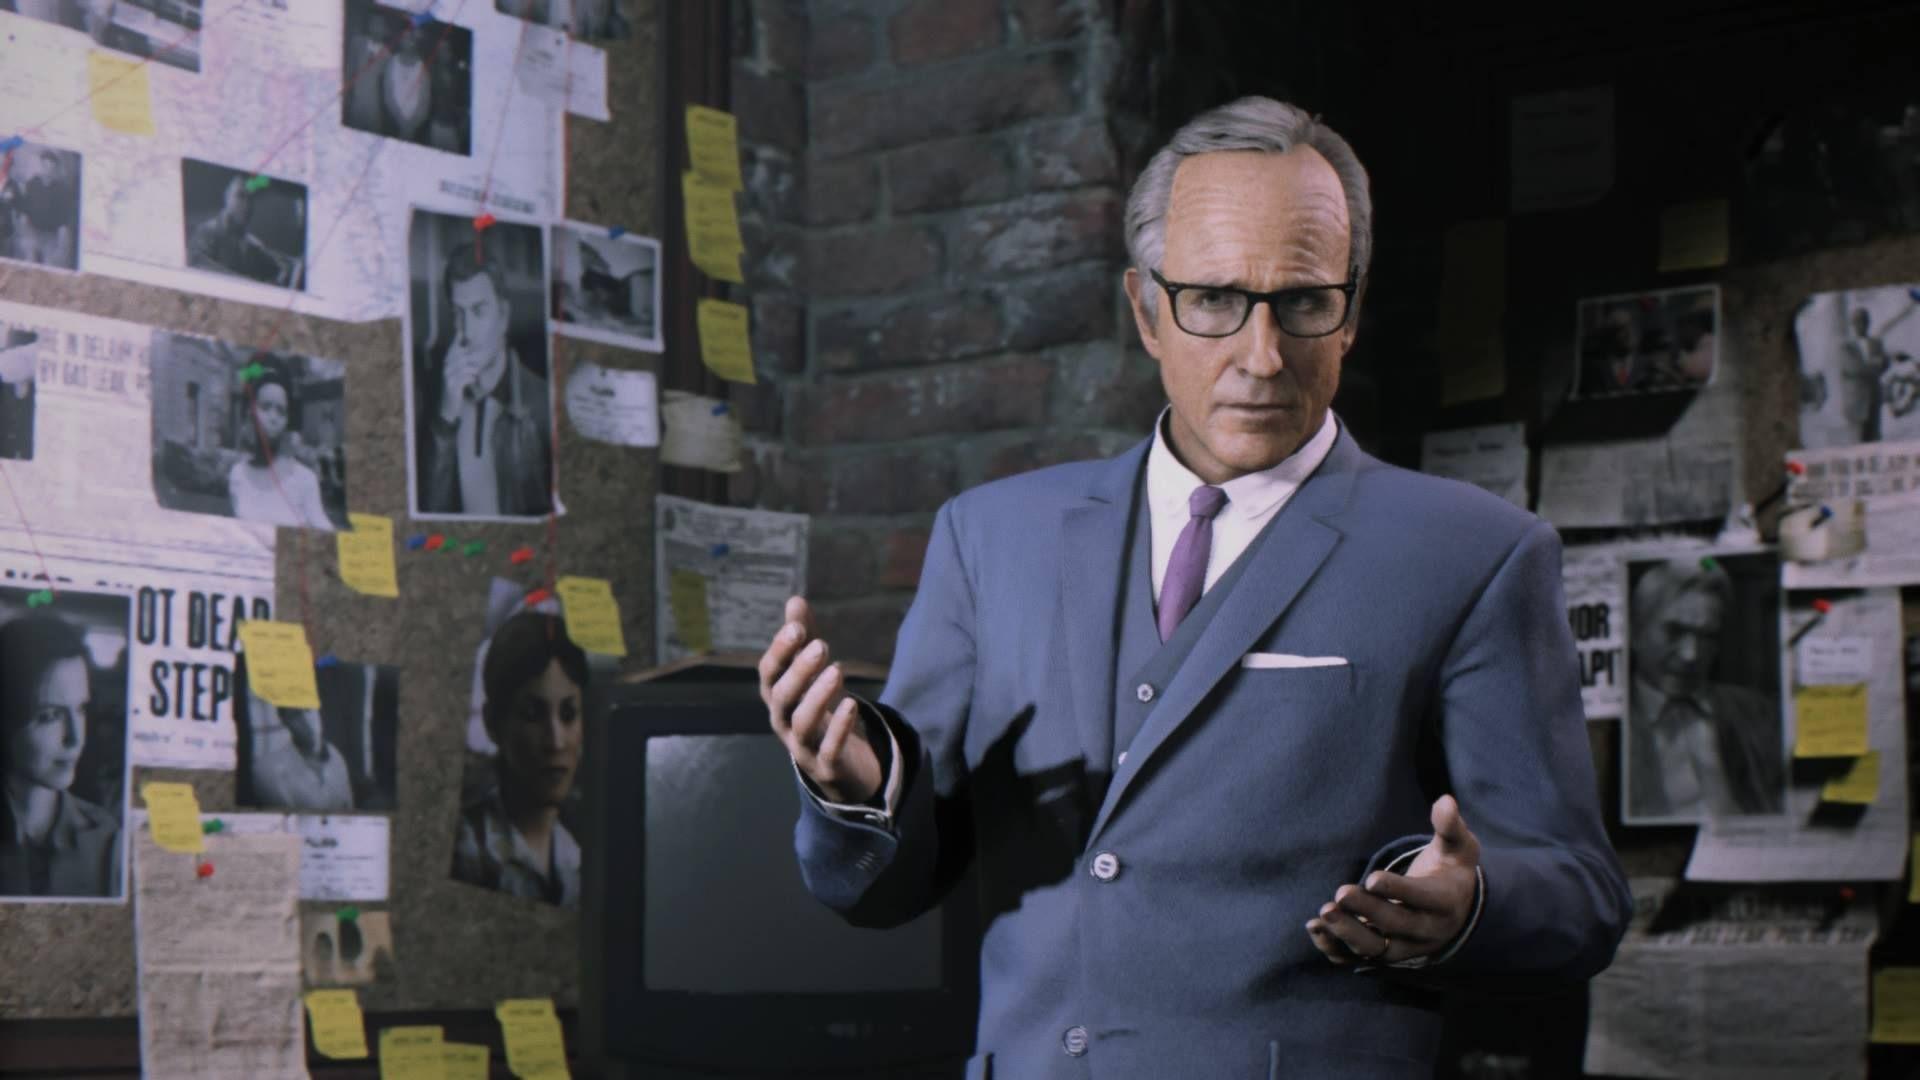 Jonathan Maguire -  Director del FBI / Mafia III (Mafia 3) / PS4 Share #PC #PlayStation4 #PS4 #XboxOne #MAFIA #MAFIA3 #MAFIAIII #CosaNostra #MafiaGame #PS4Share #JonathanMaguire #FBI